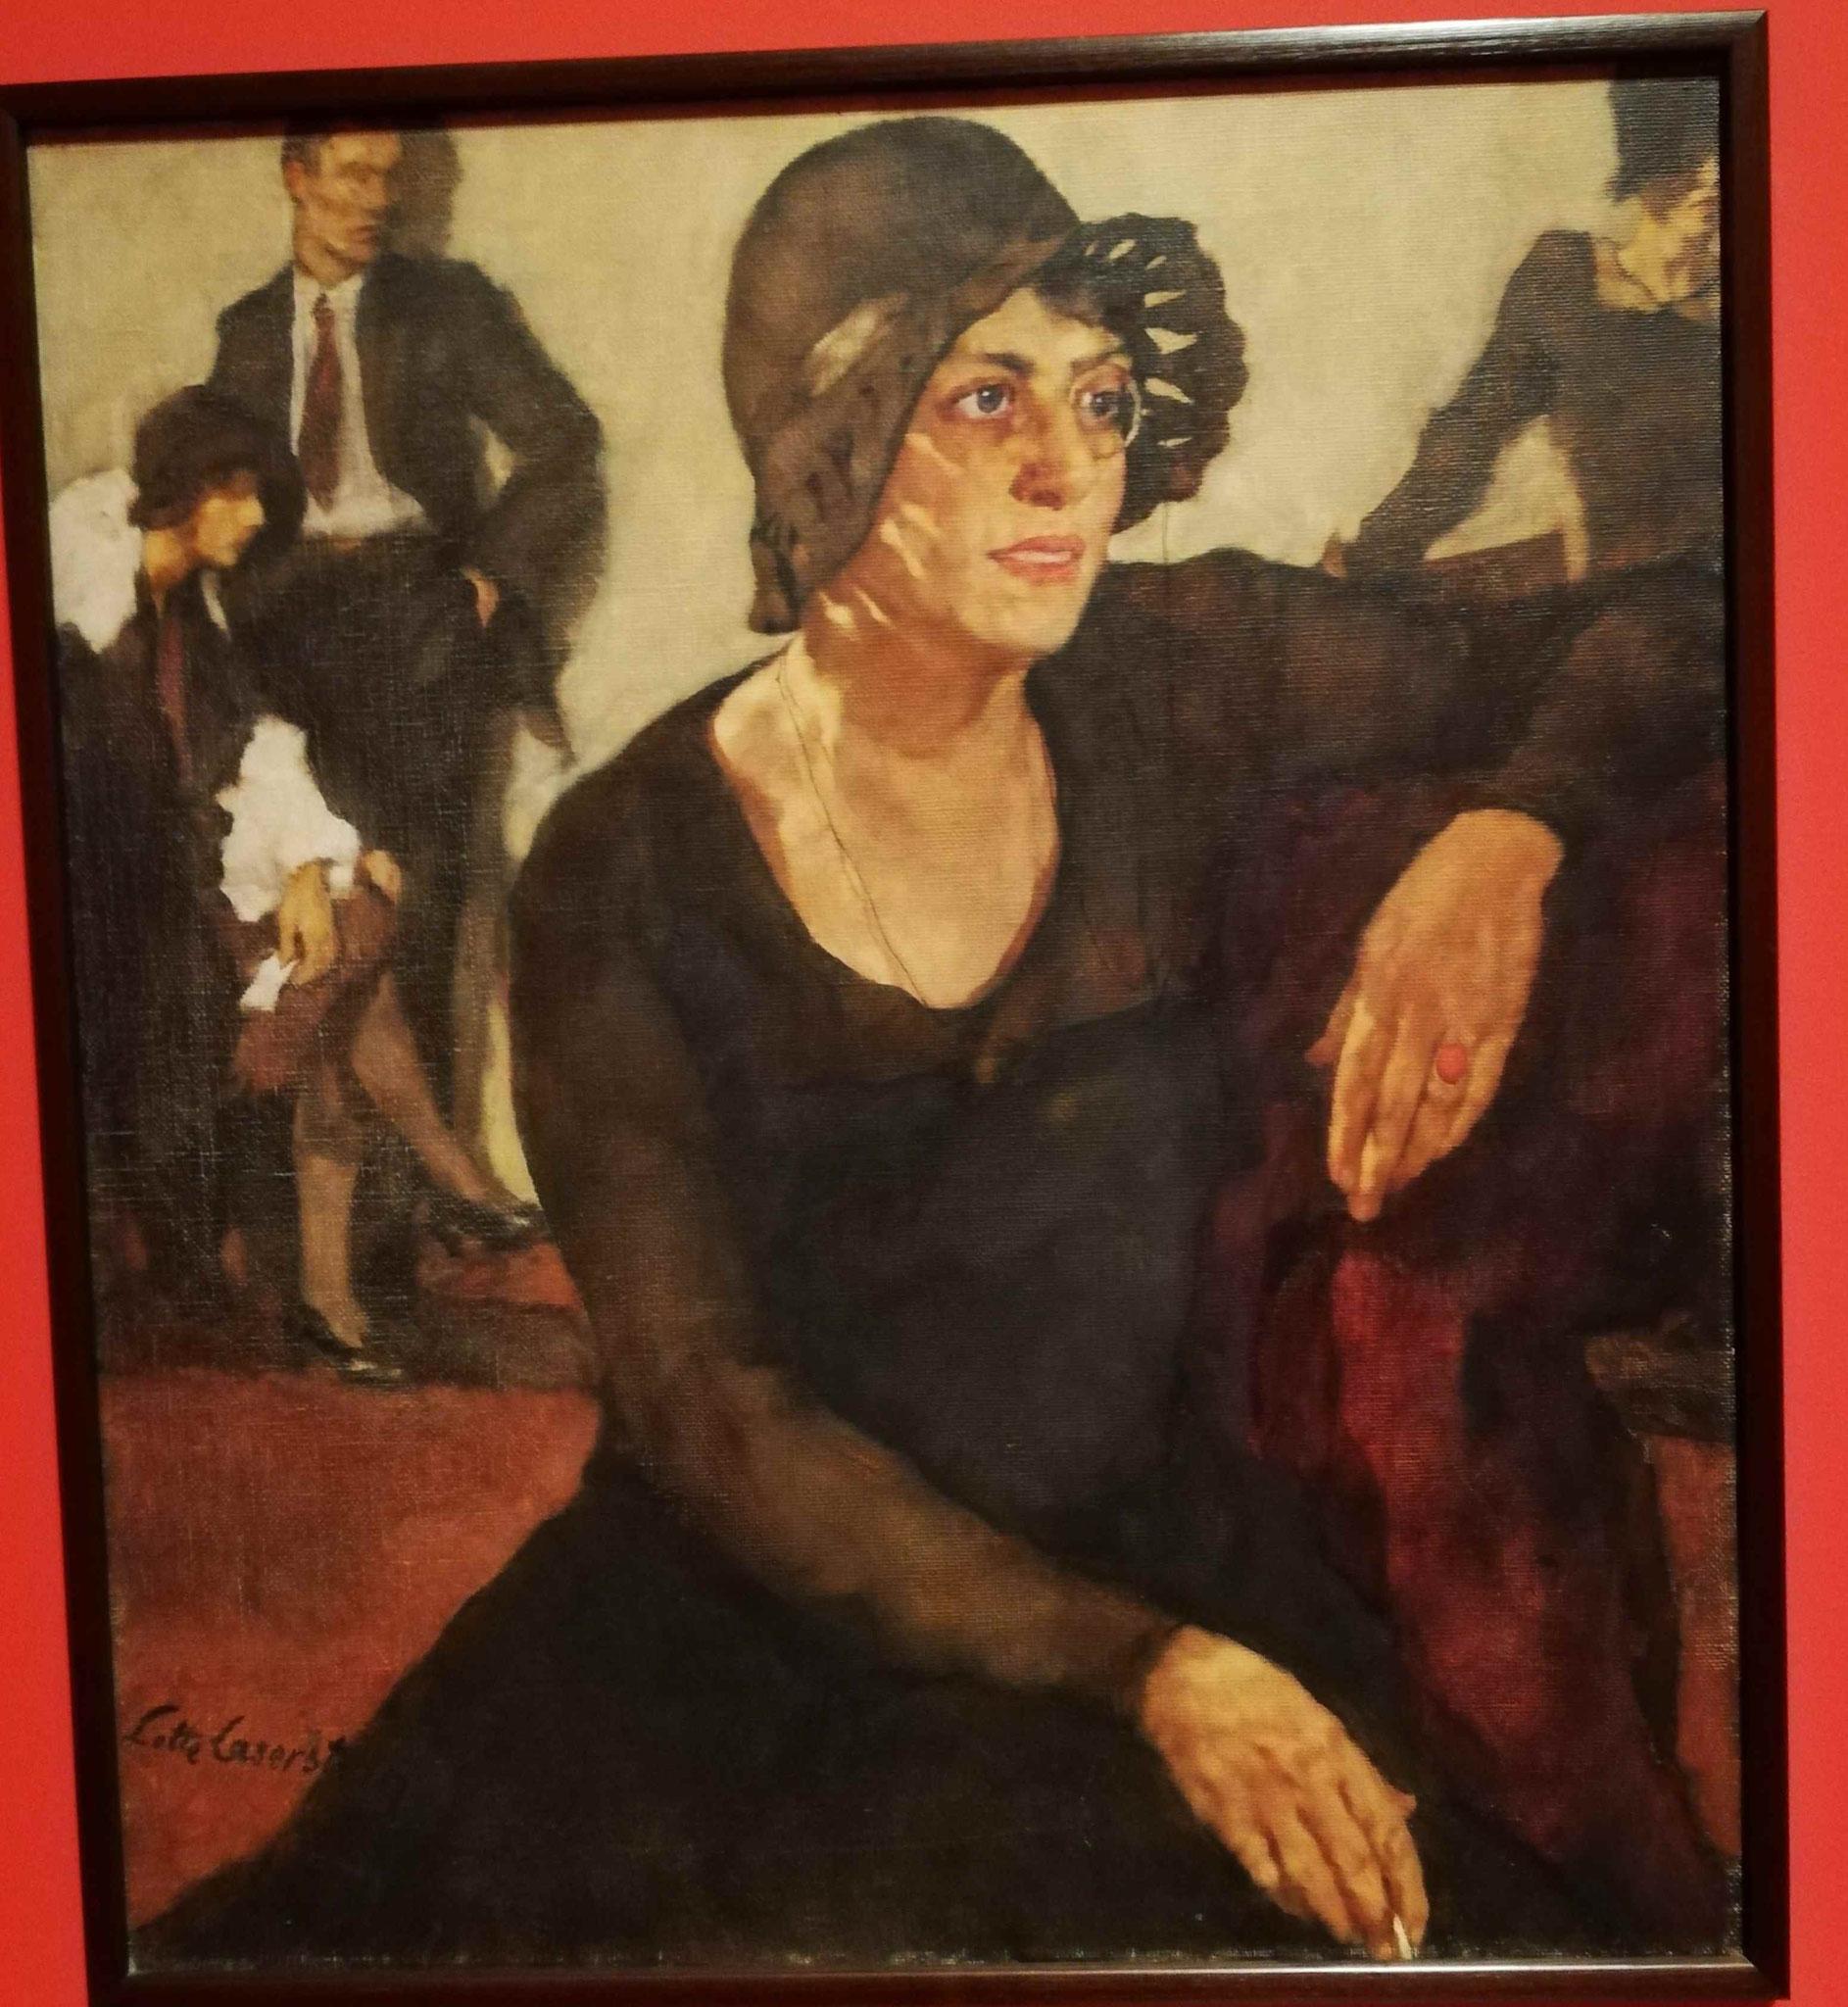 Lotte Laserstein, Polly Tieck, 1929